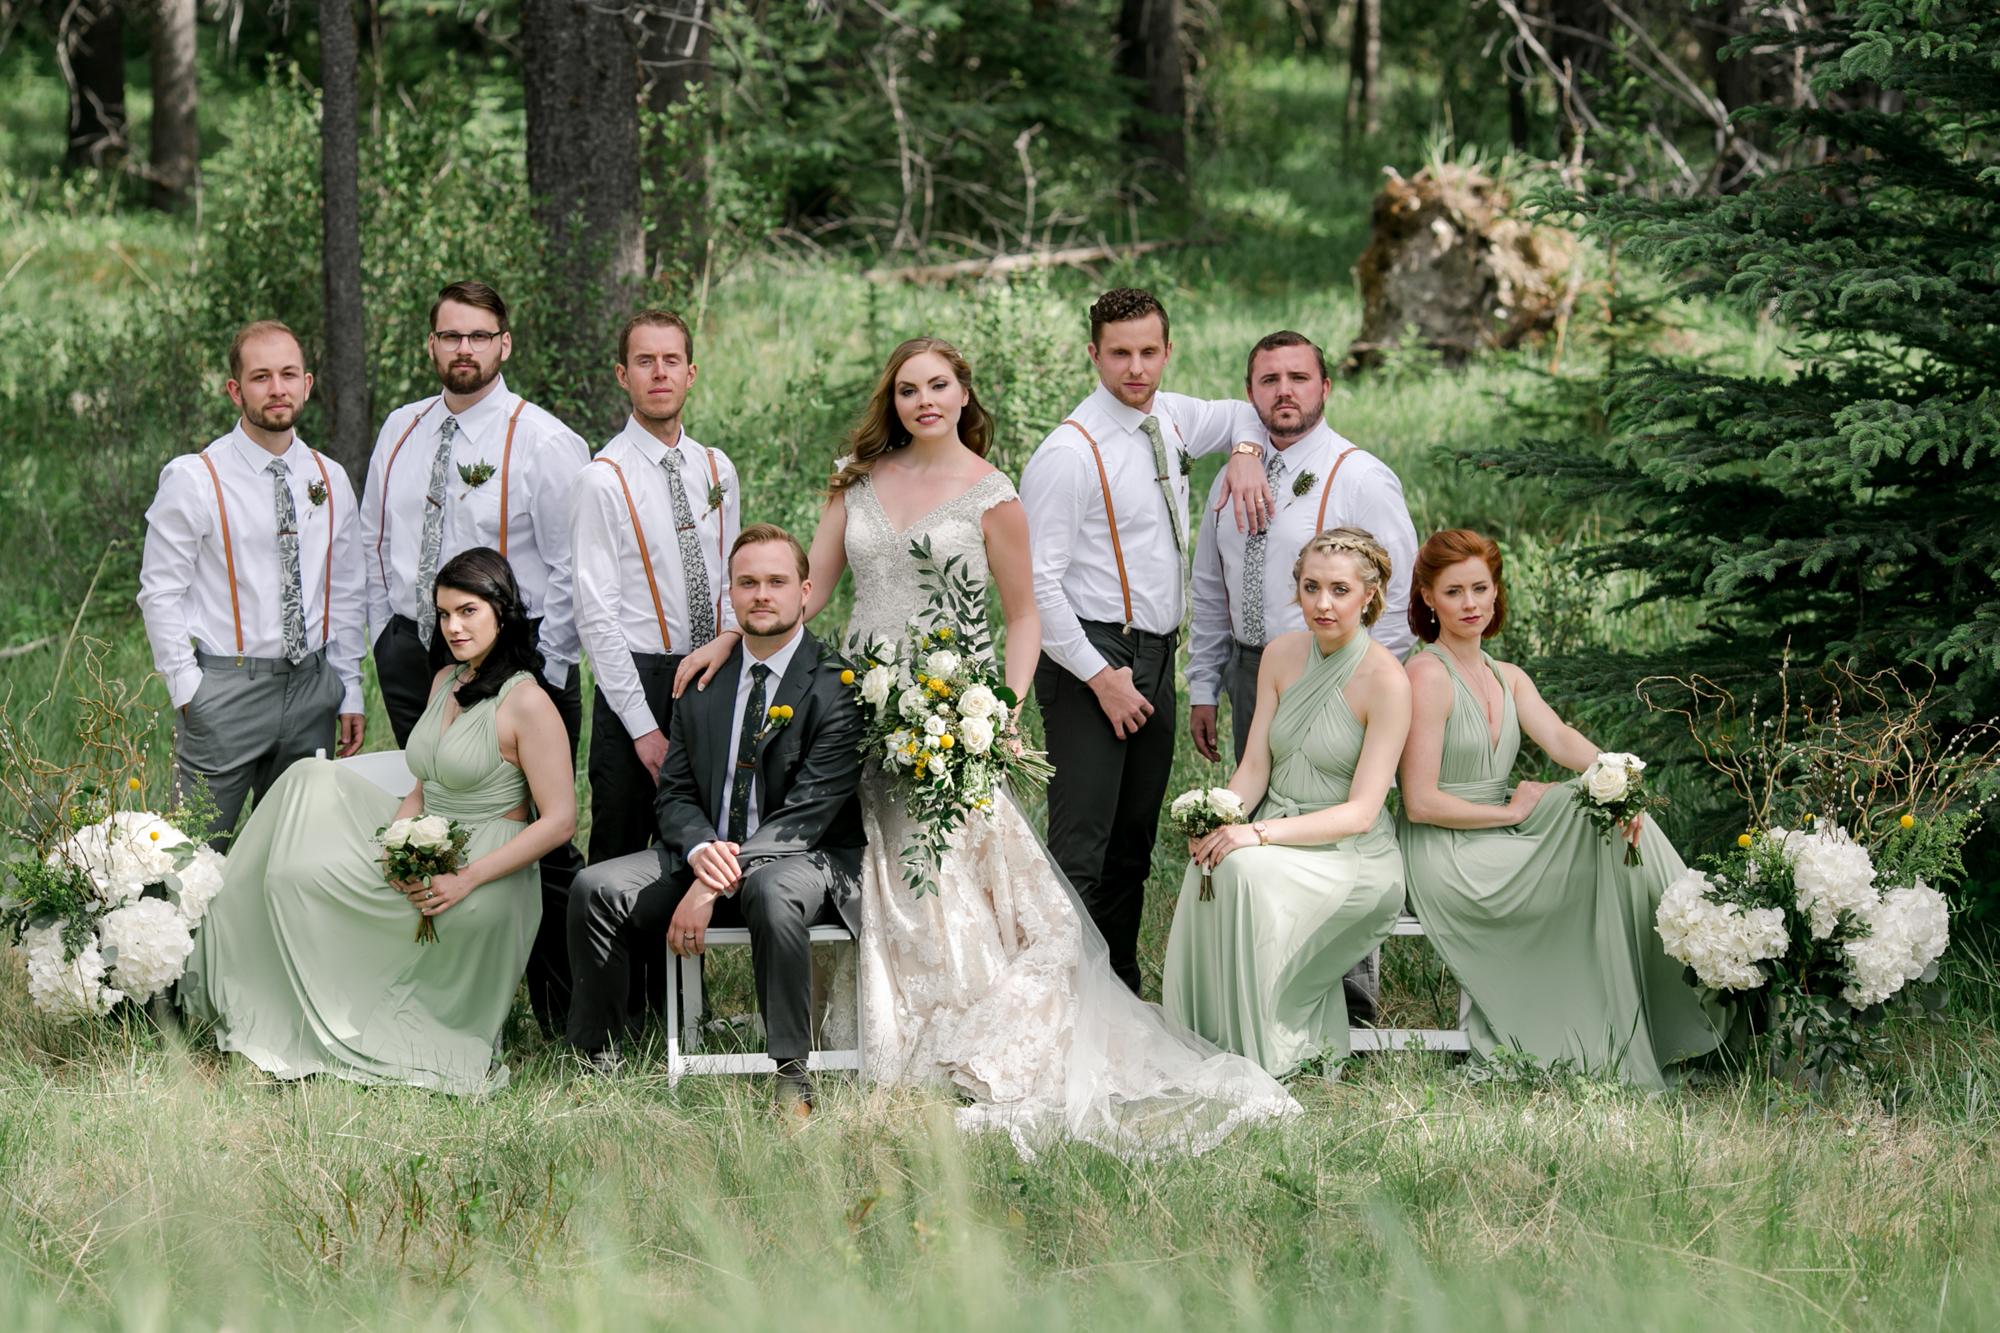 vancouver-luxury-wedding-photographer-lori-miles-226.jpg